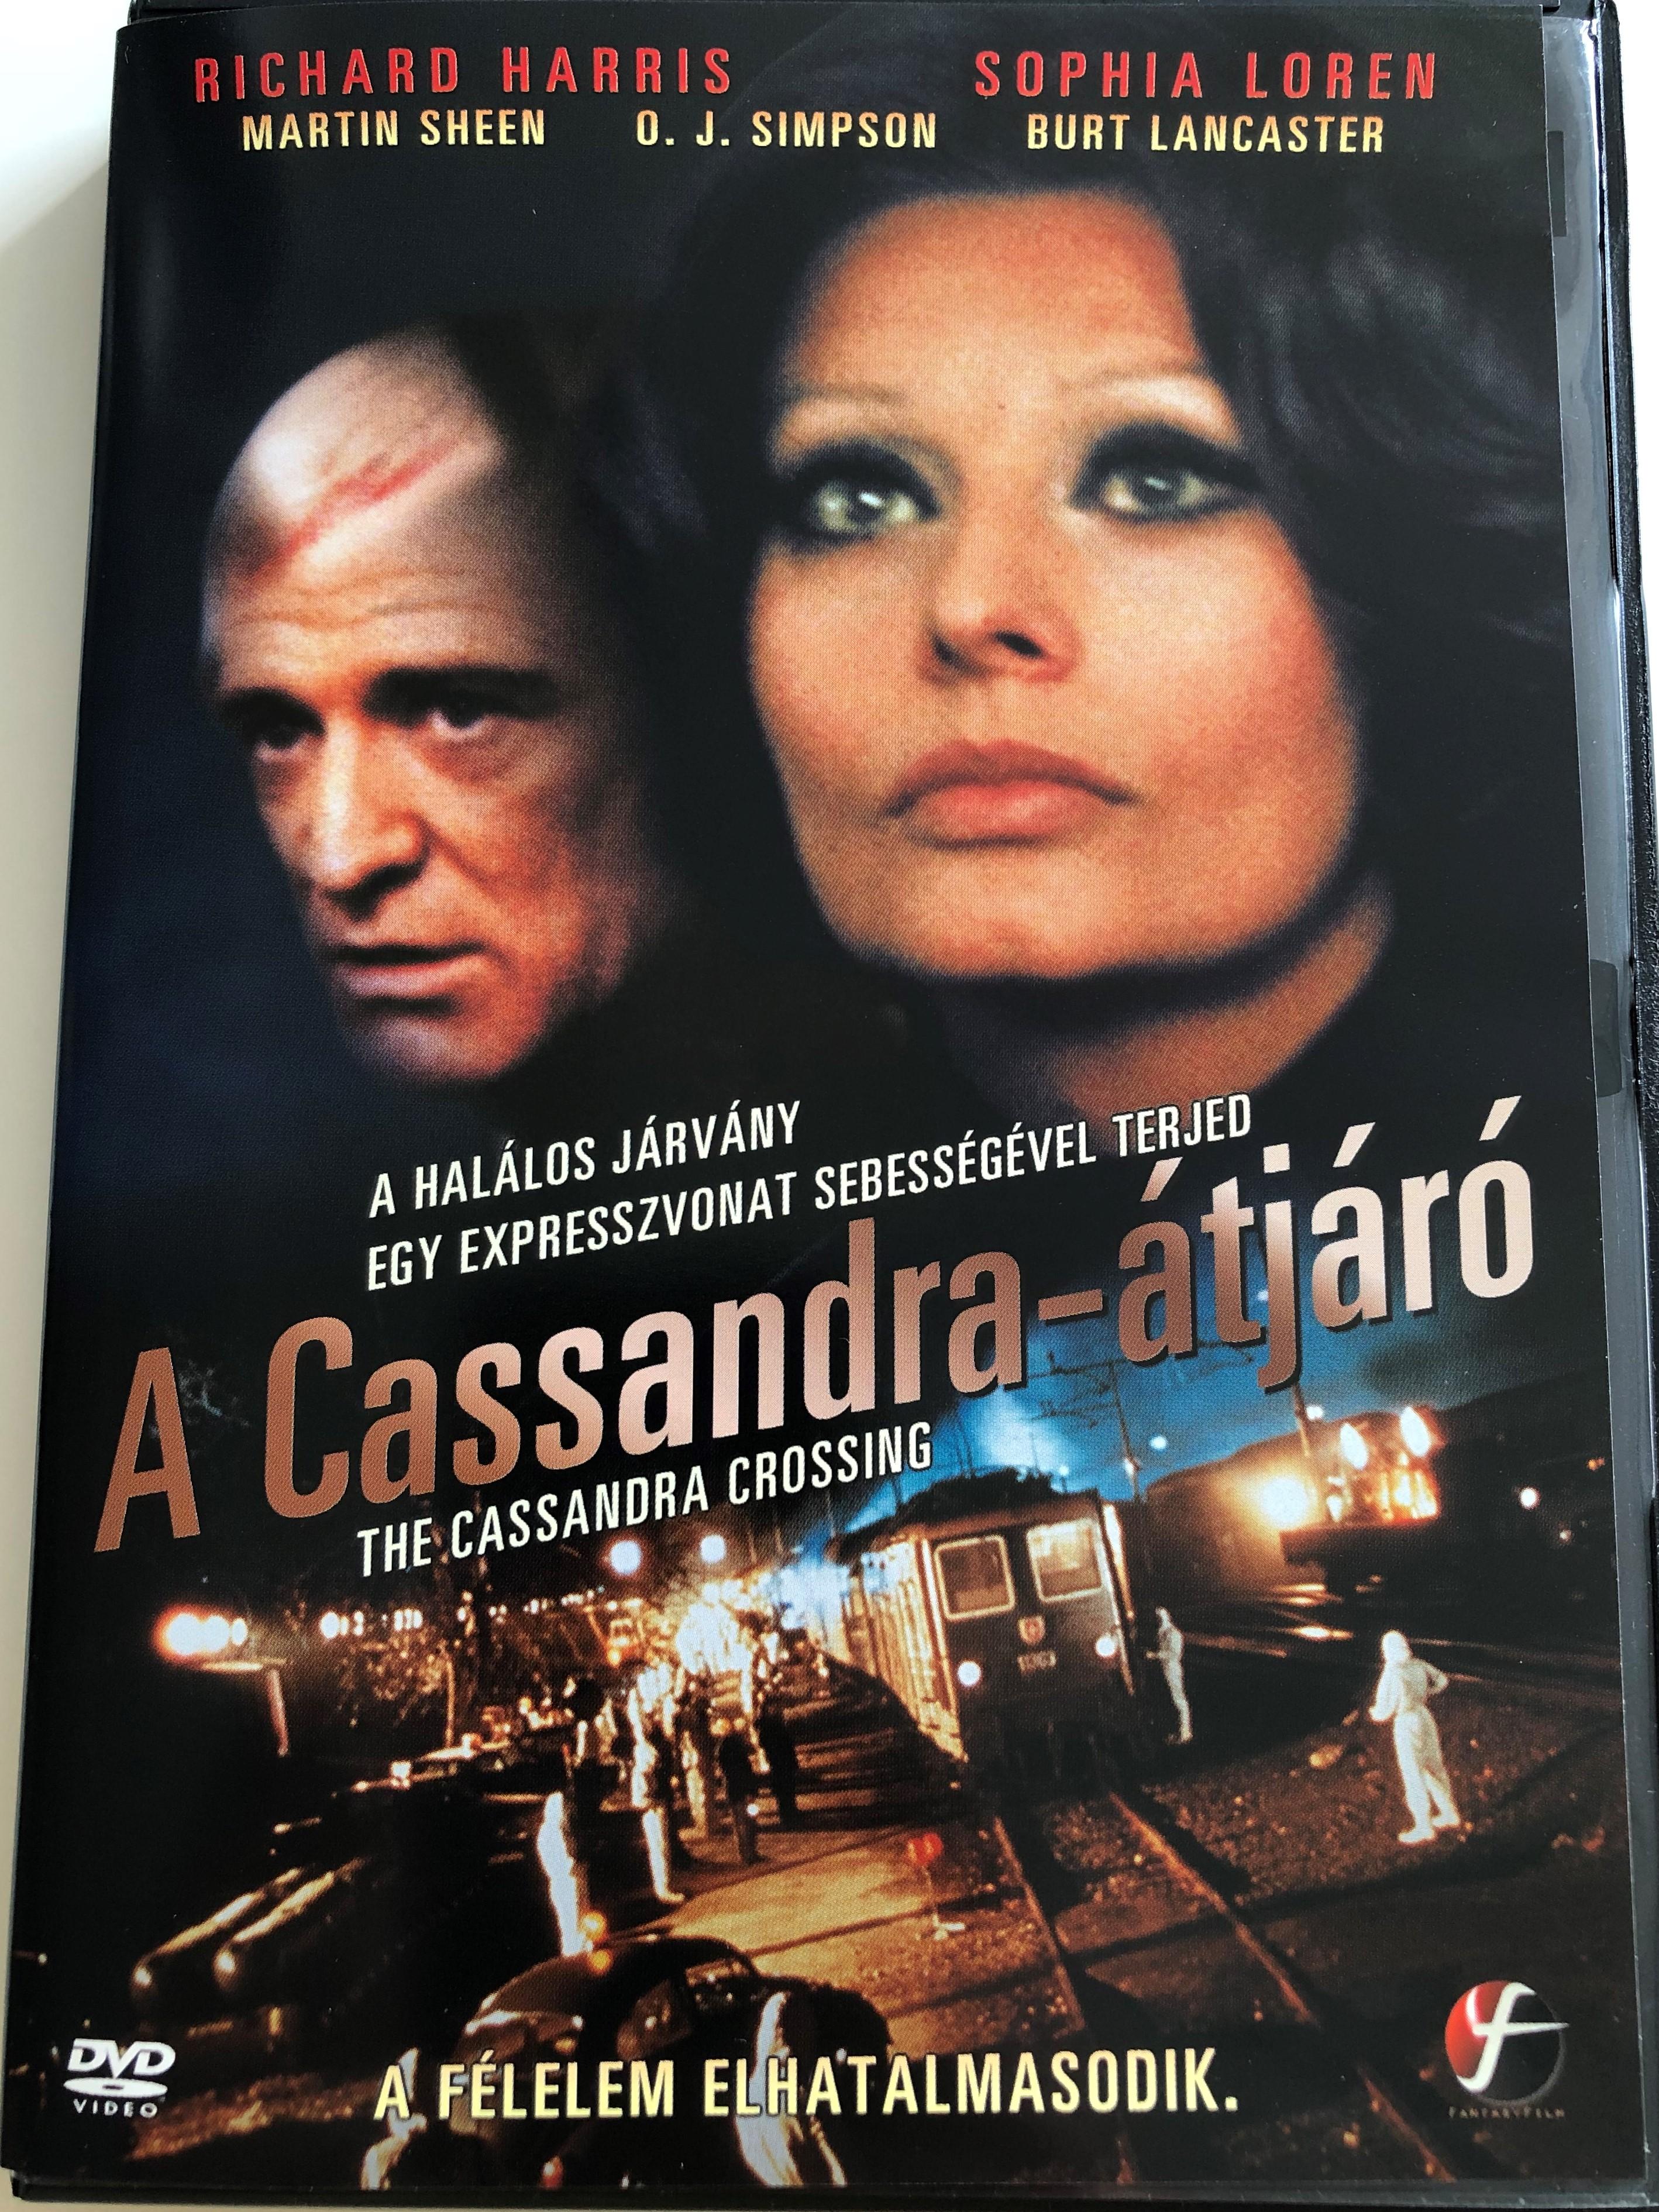 the-cassandra-crossing-dvd-1976-a-cassandra-tj-r-directed-by-george-pan-cosmatos-starring-sophia-loren-richard-harris-martin-sheen-o.j-simpson-lionel-stander-ann-turkel-burt-lancaster-ava-gardner-1-.jpg